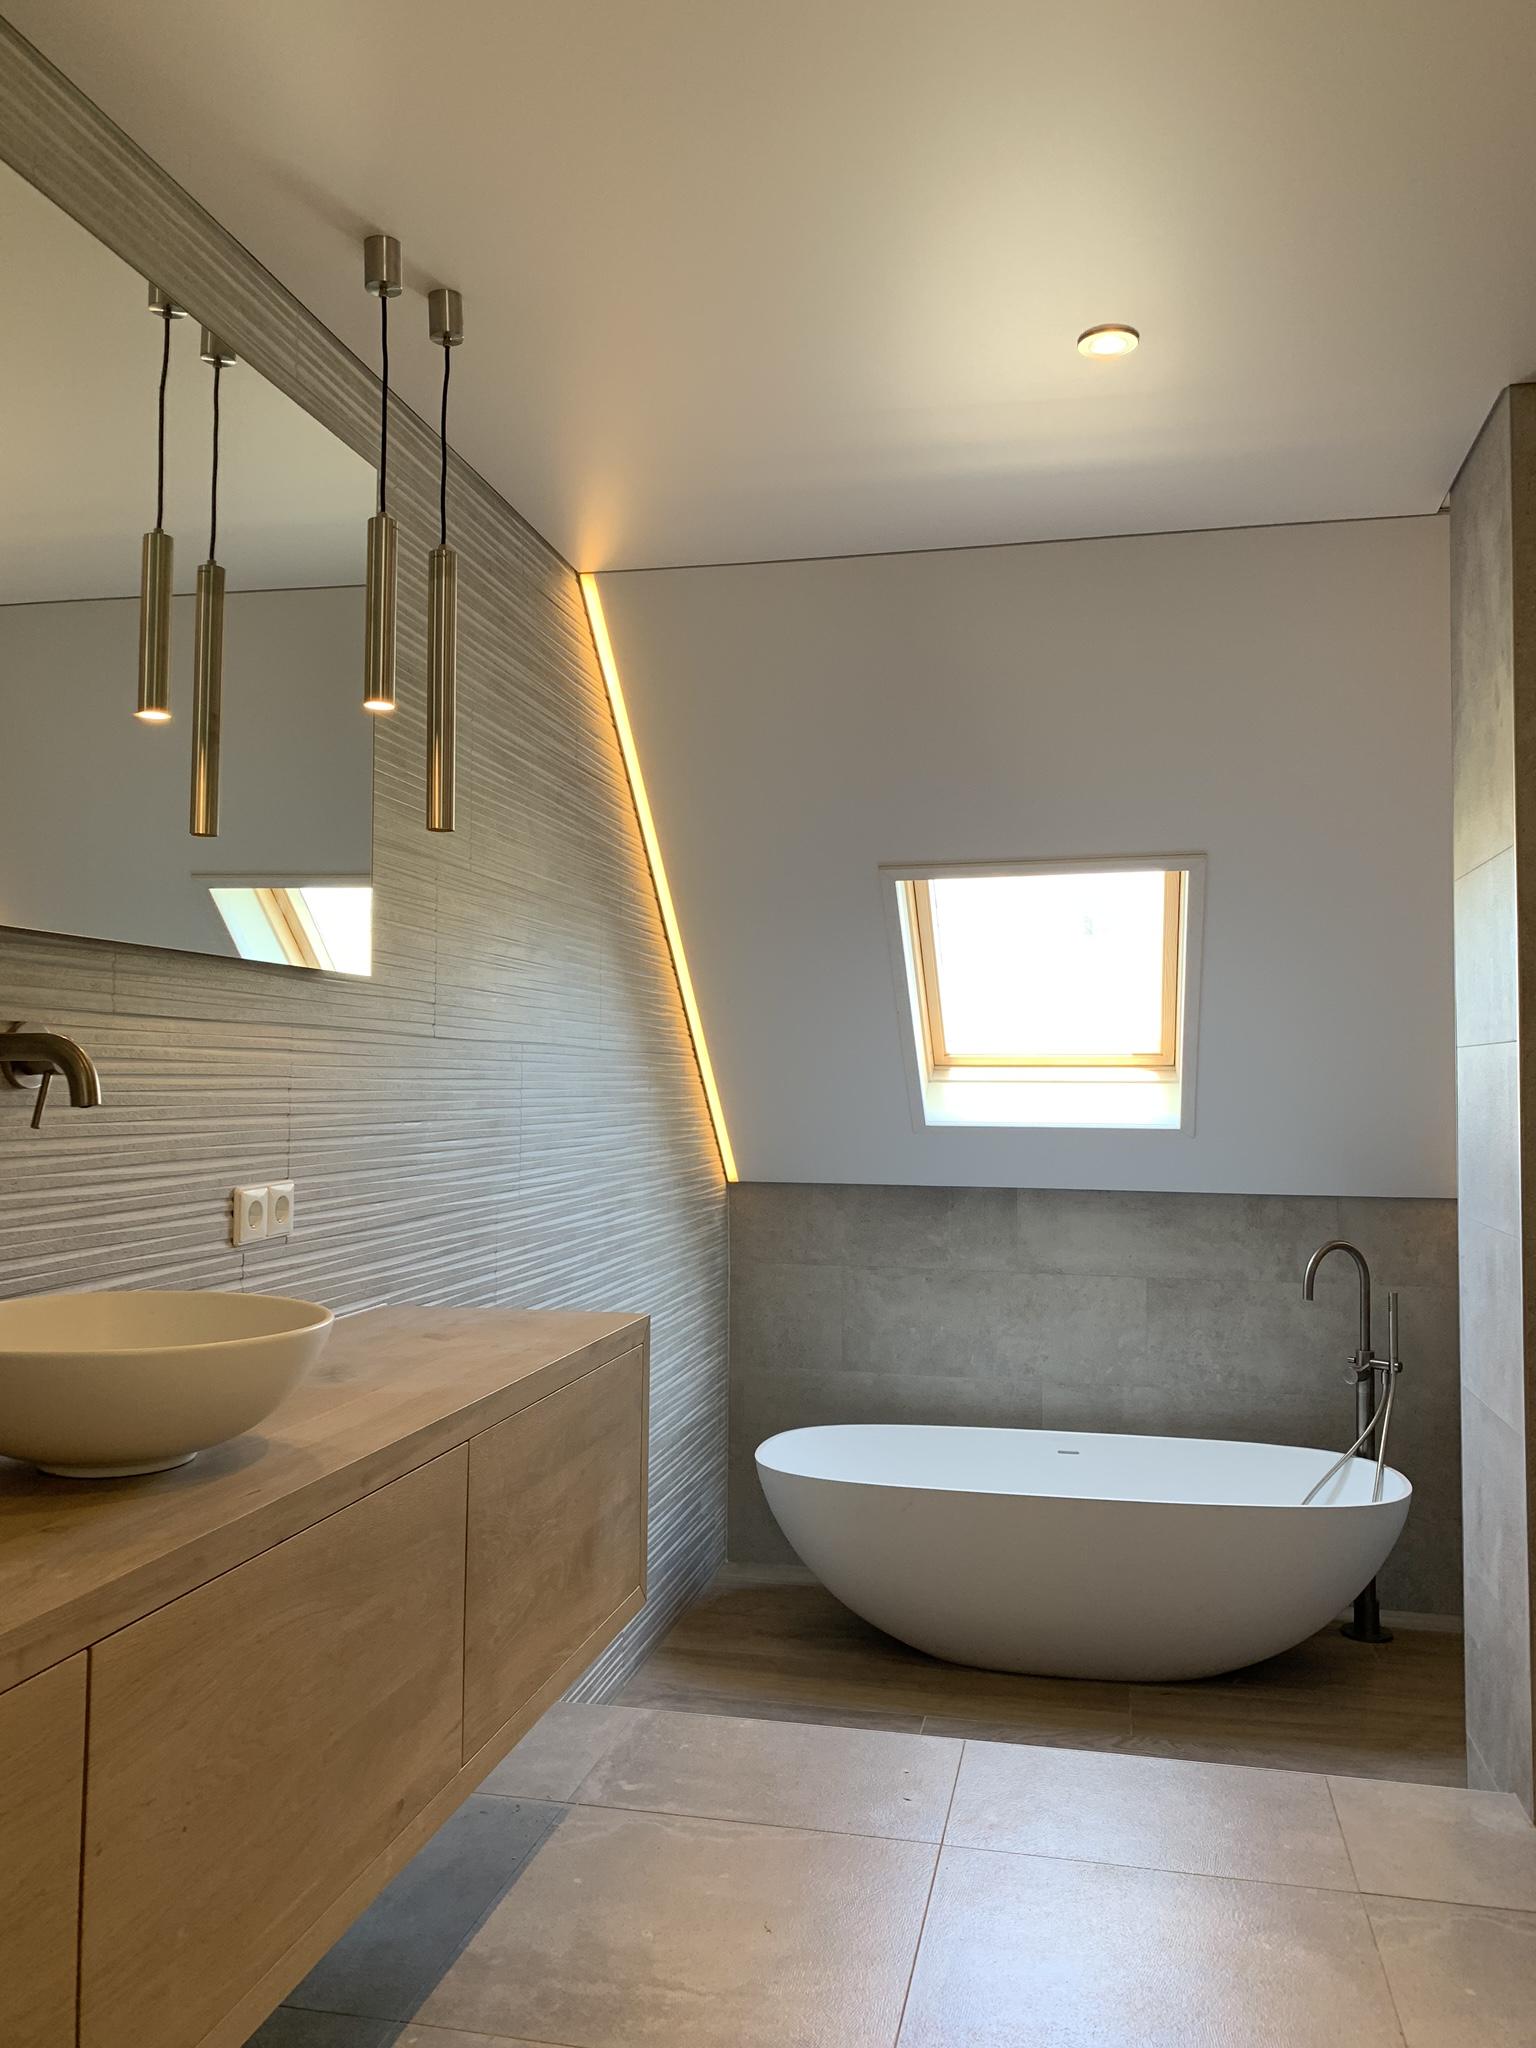 spanplafond in uw badkamer met led verlichting